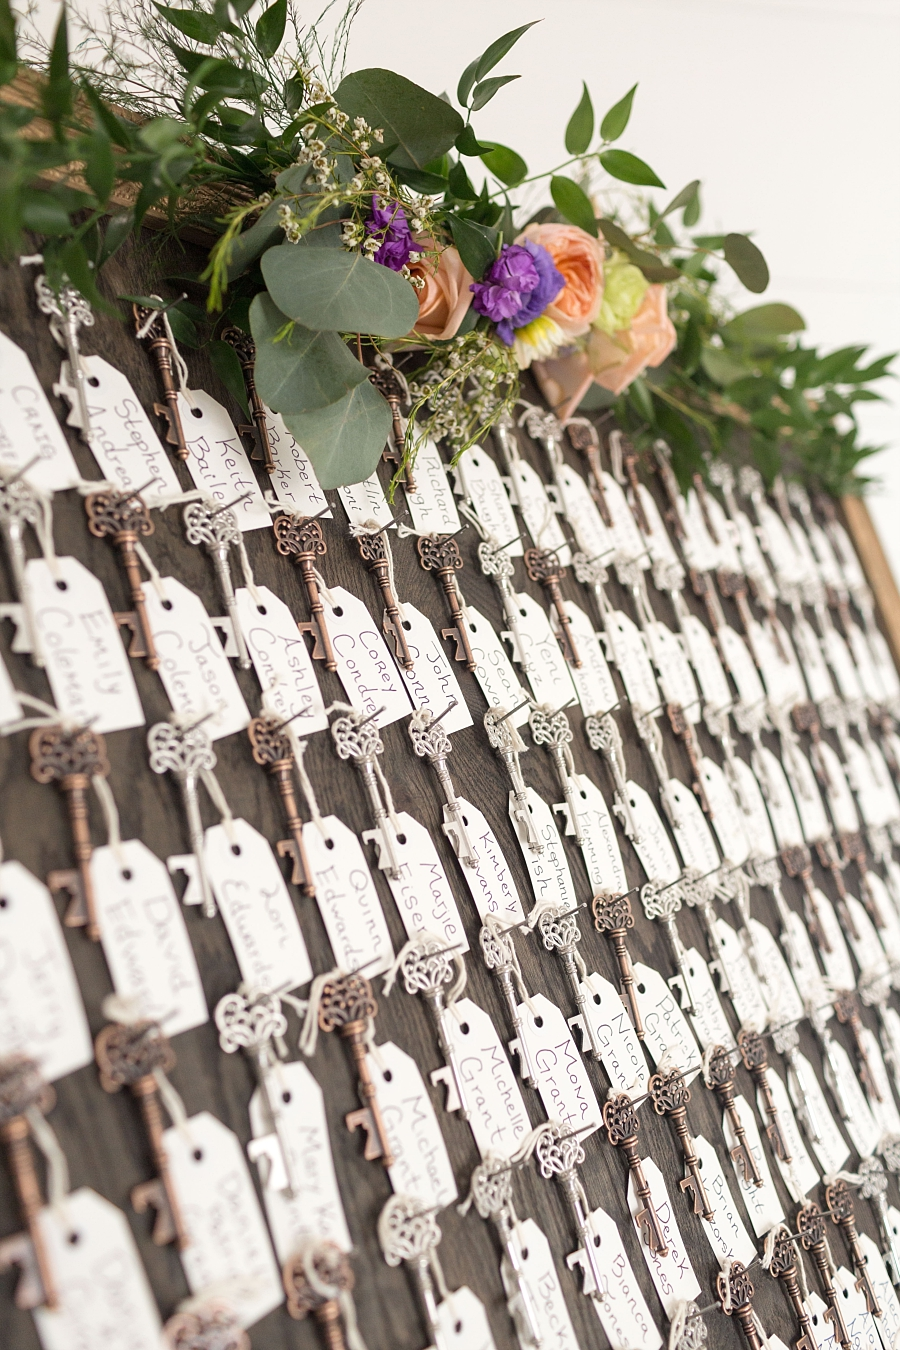 Stacy-Anderson-Photography-The-Farmhouse-Houston-Wedding-Photographer_0007.jpg